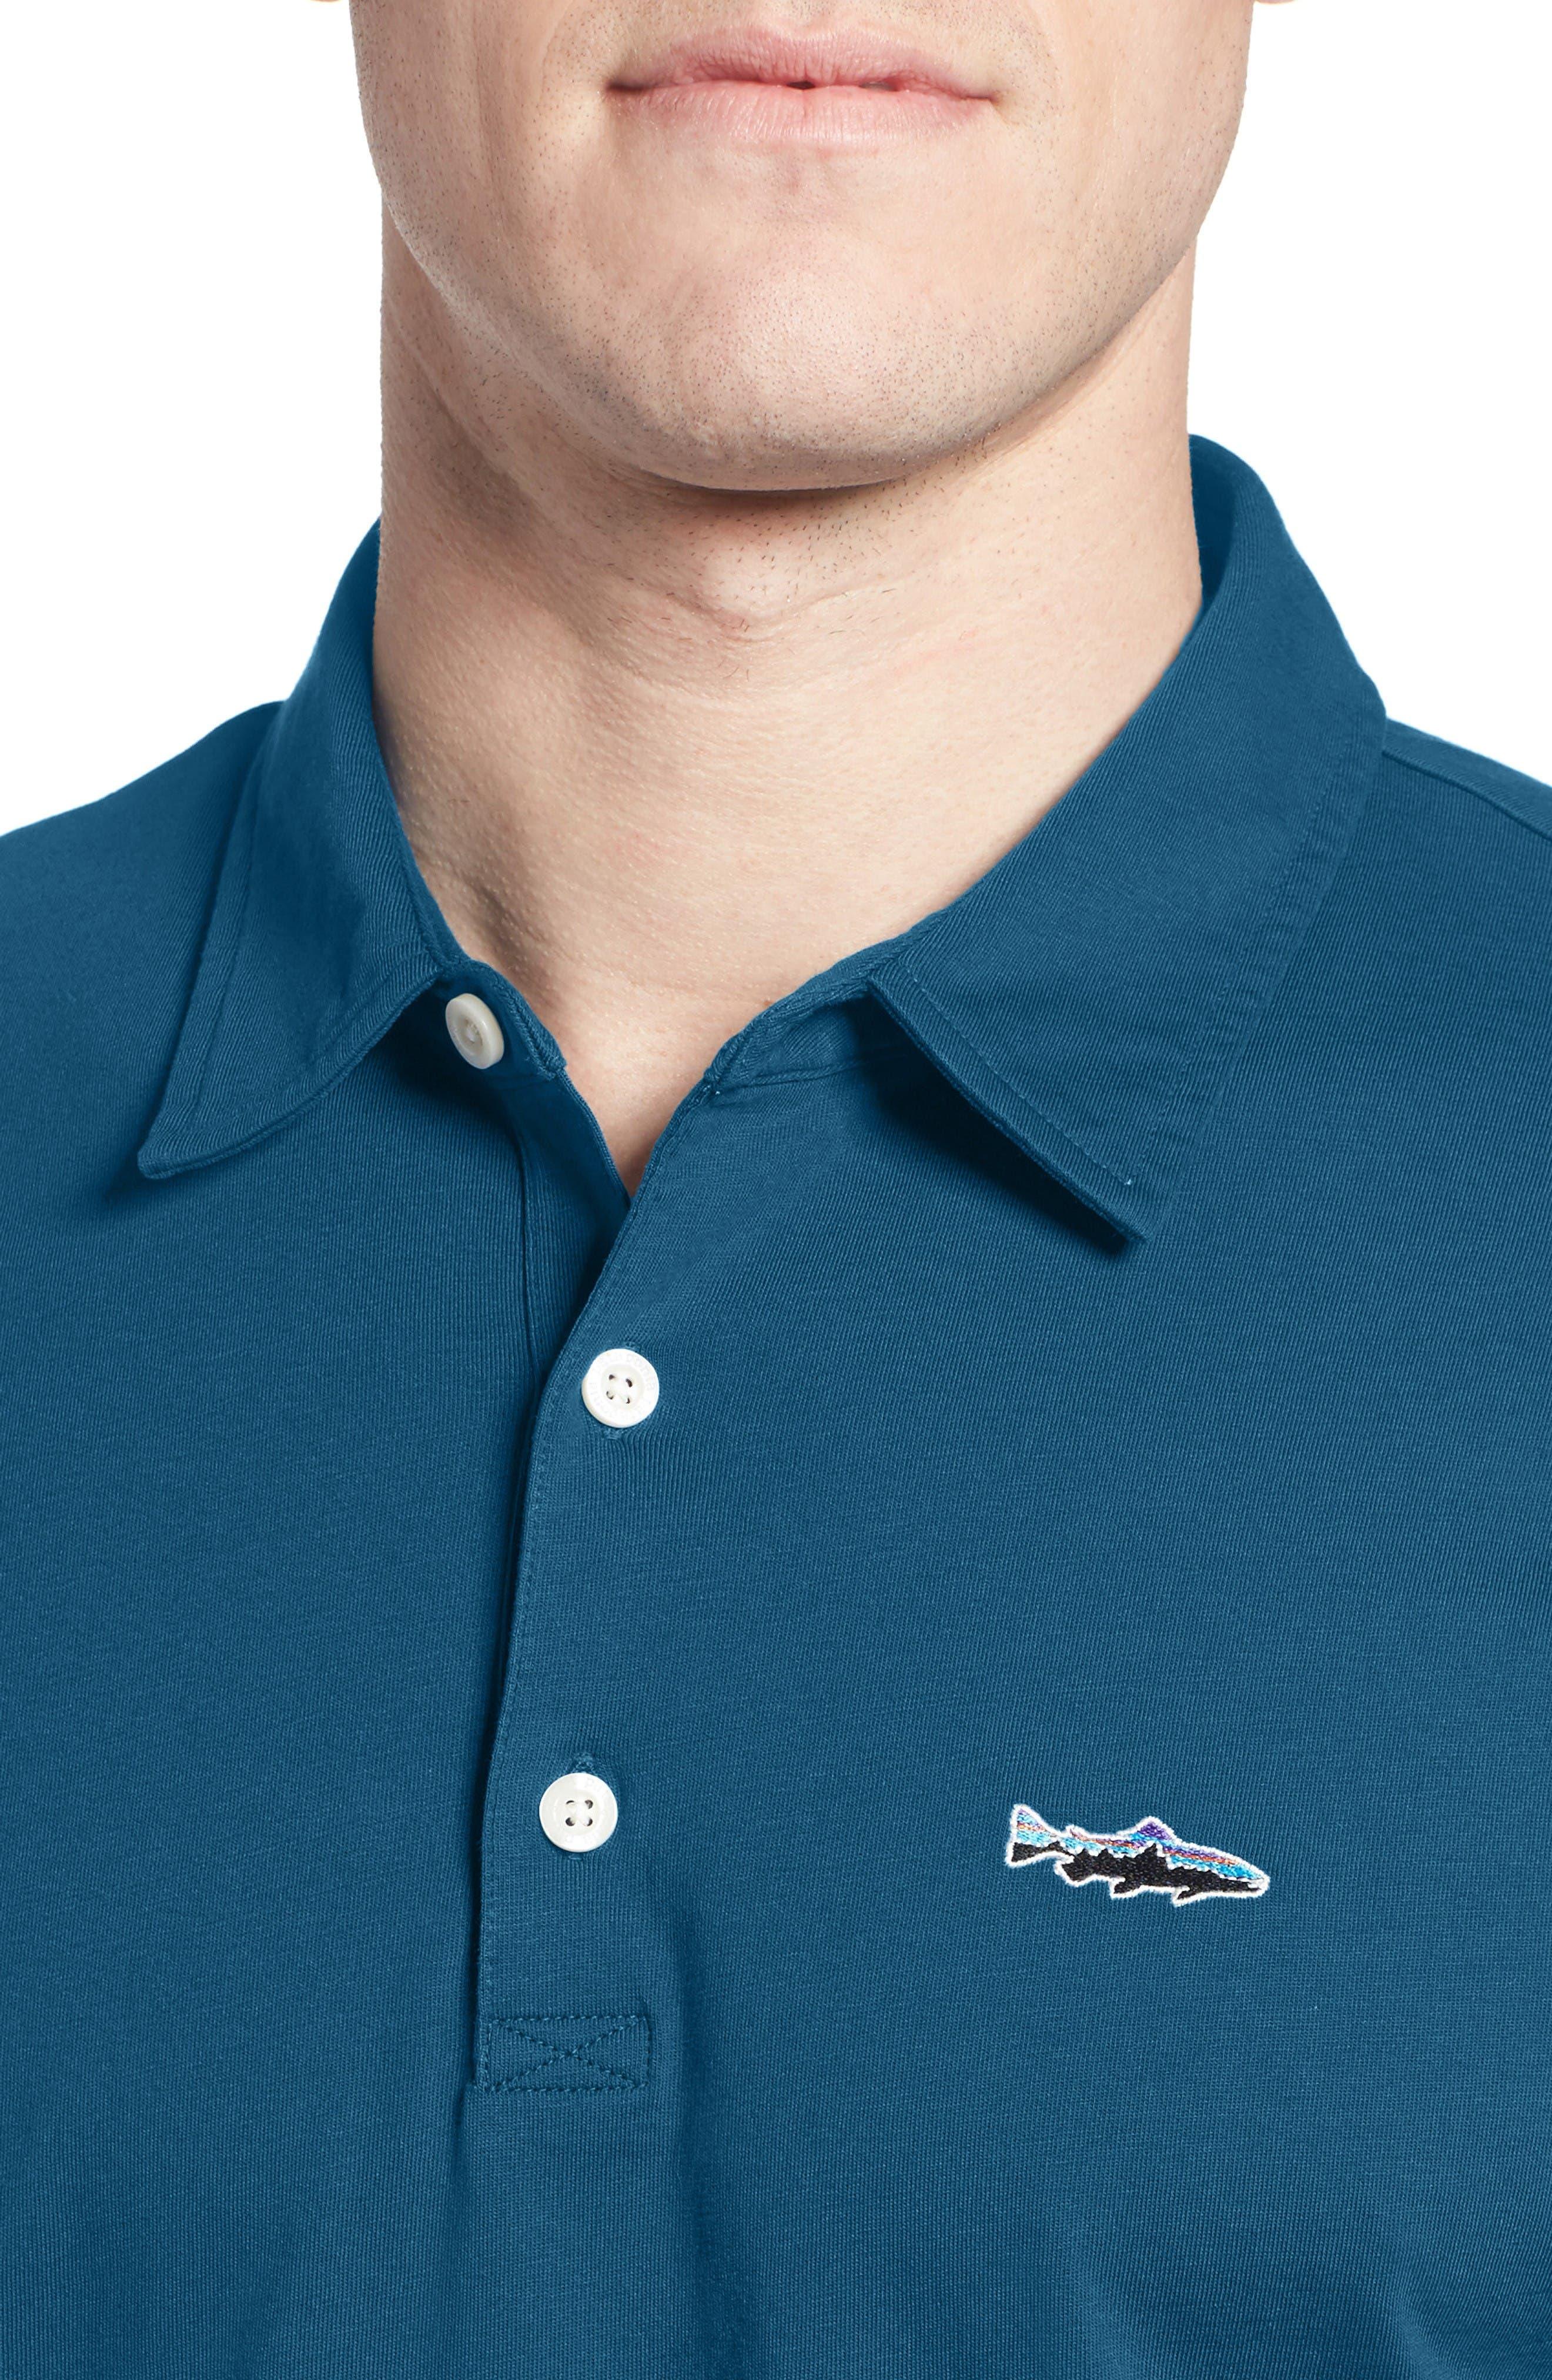 'Trout Fitz Roy' Organic Cotton Polo,                             Alternate thumbnail 8, color,                             Radar Blue